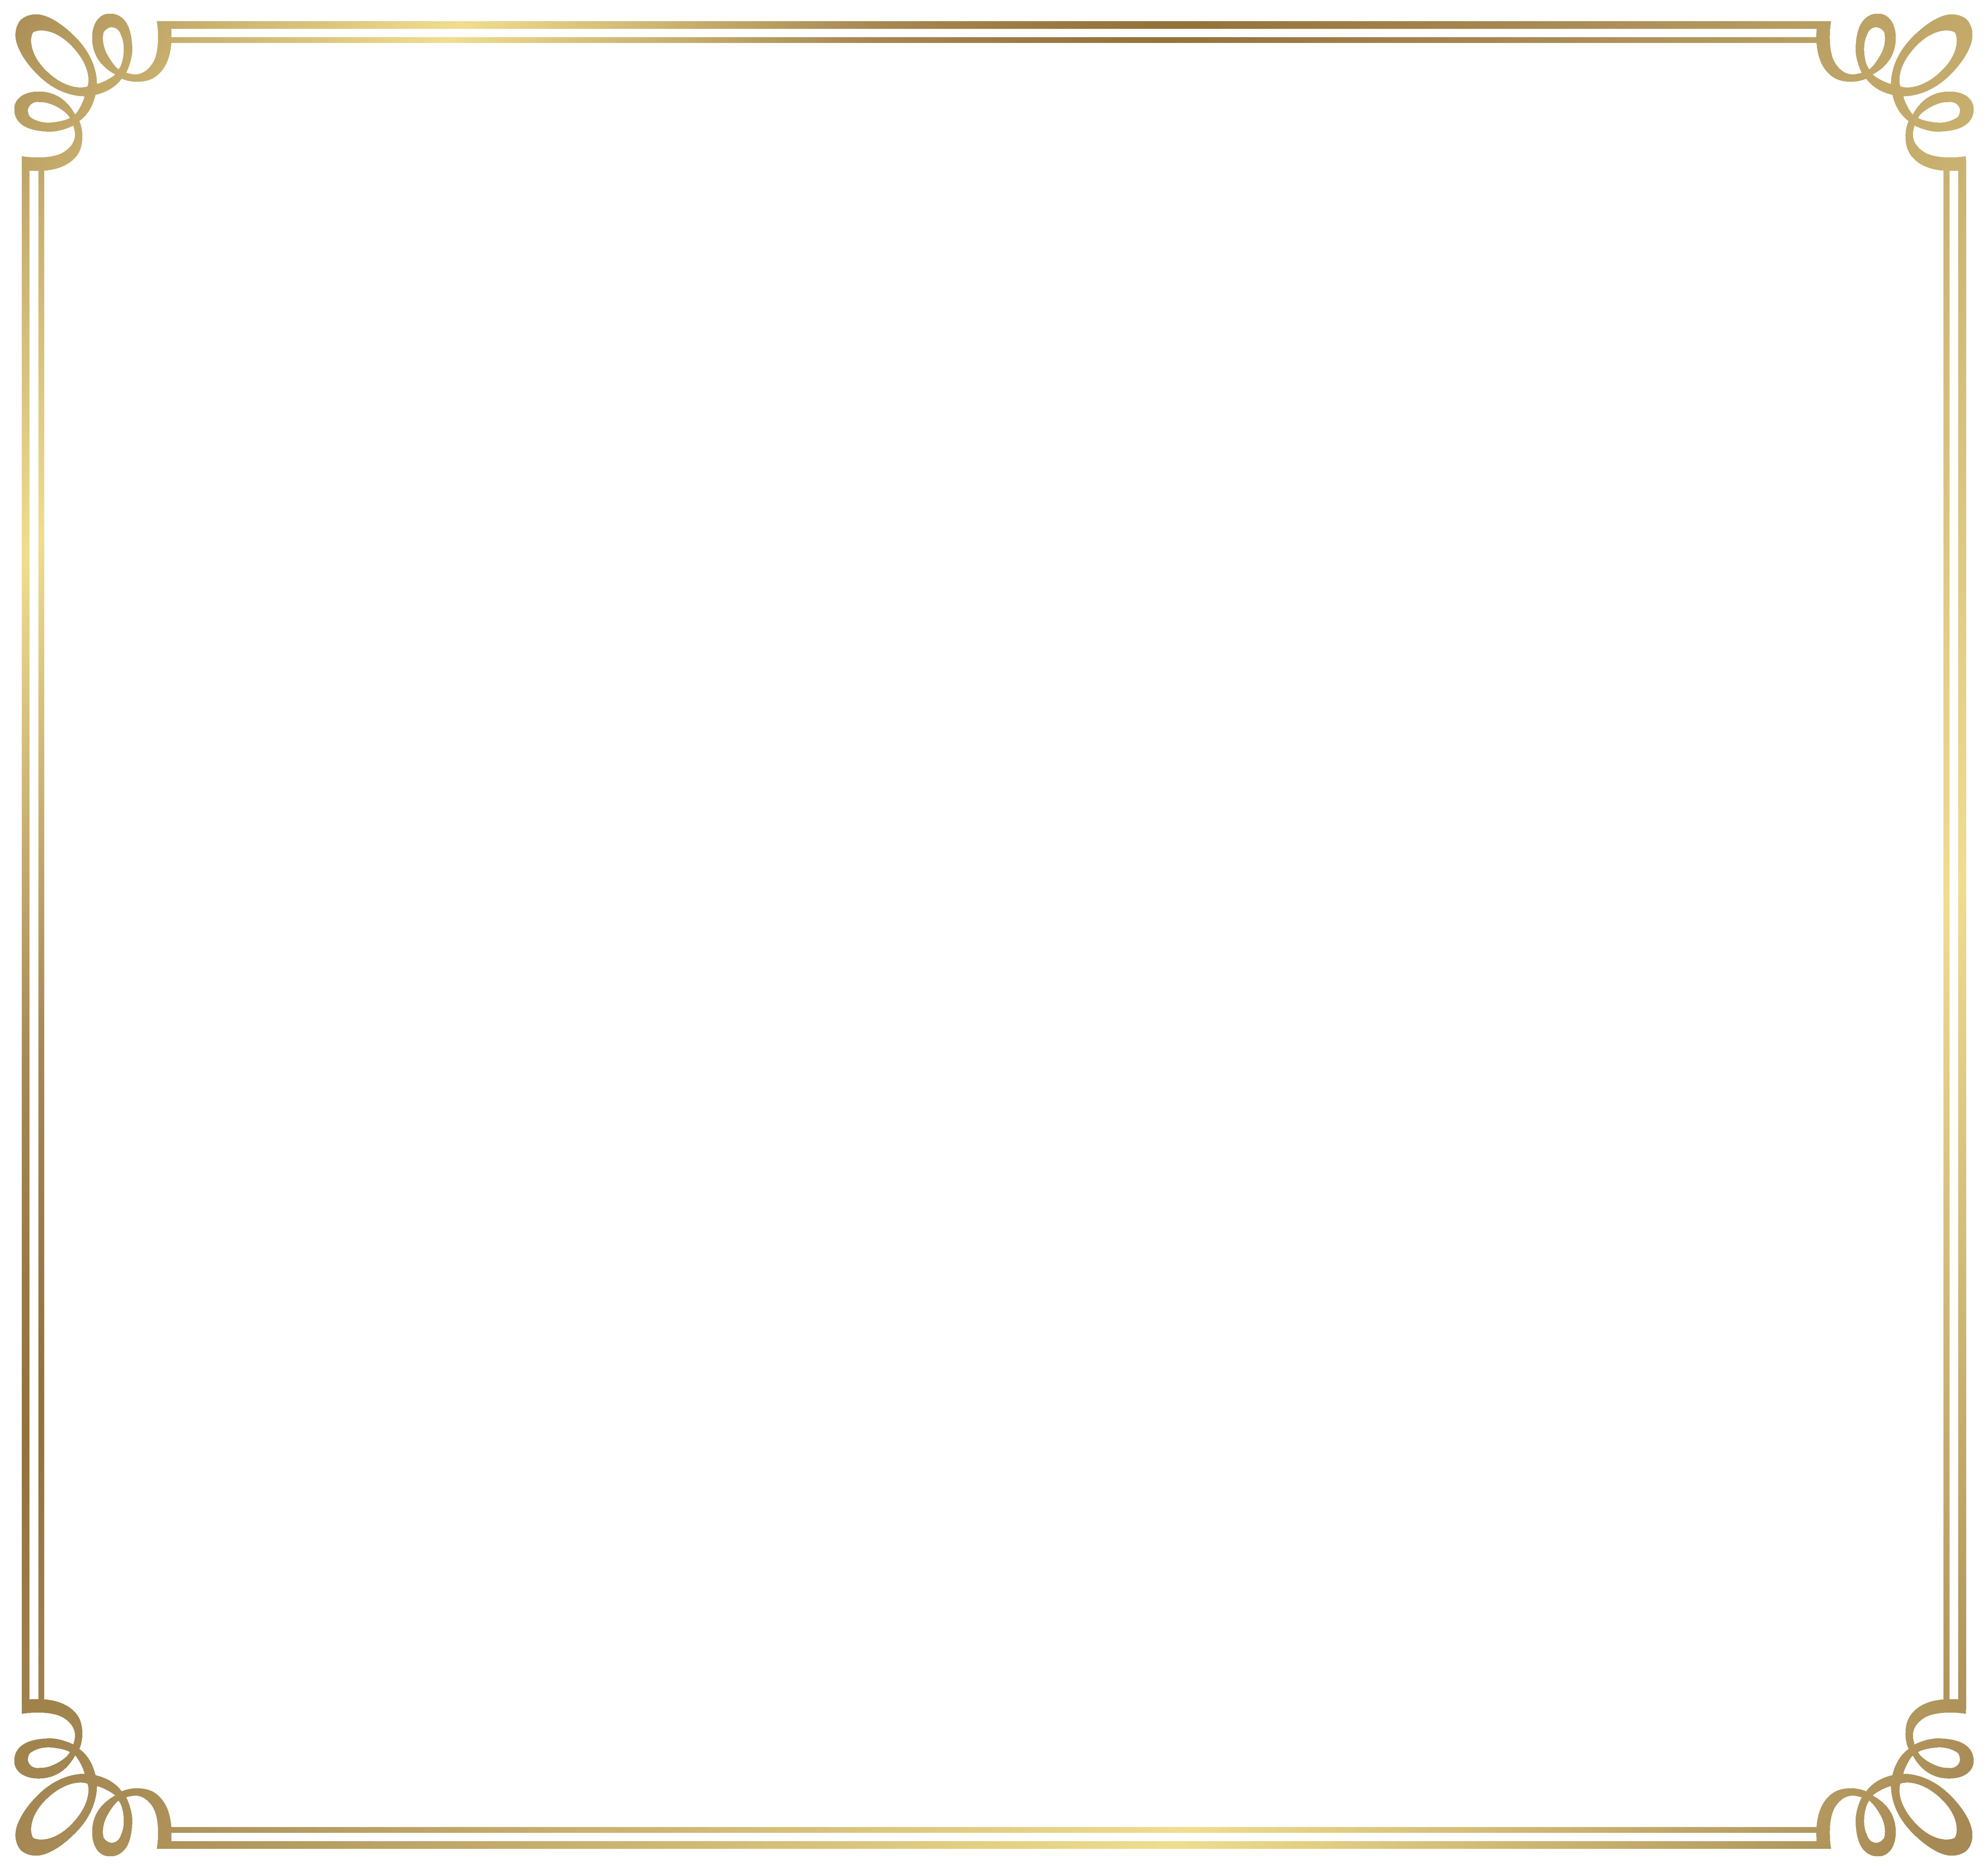 Decorative Frame Border PNG Clipart Image.